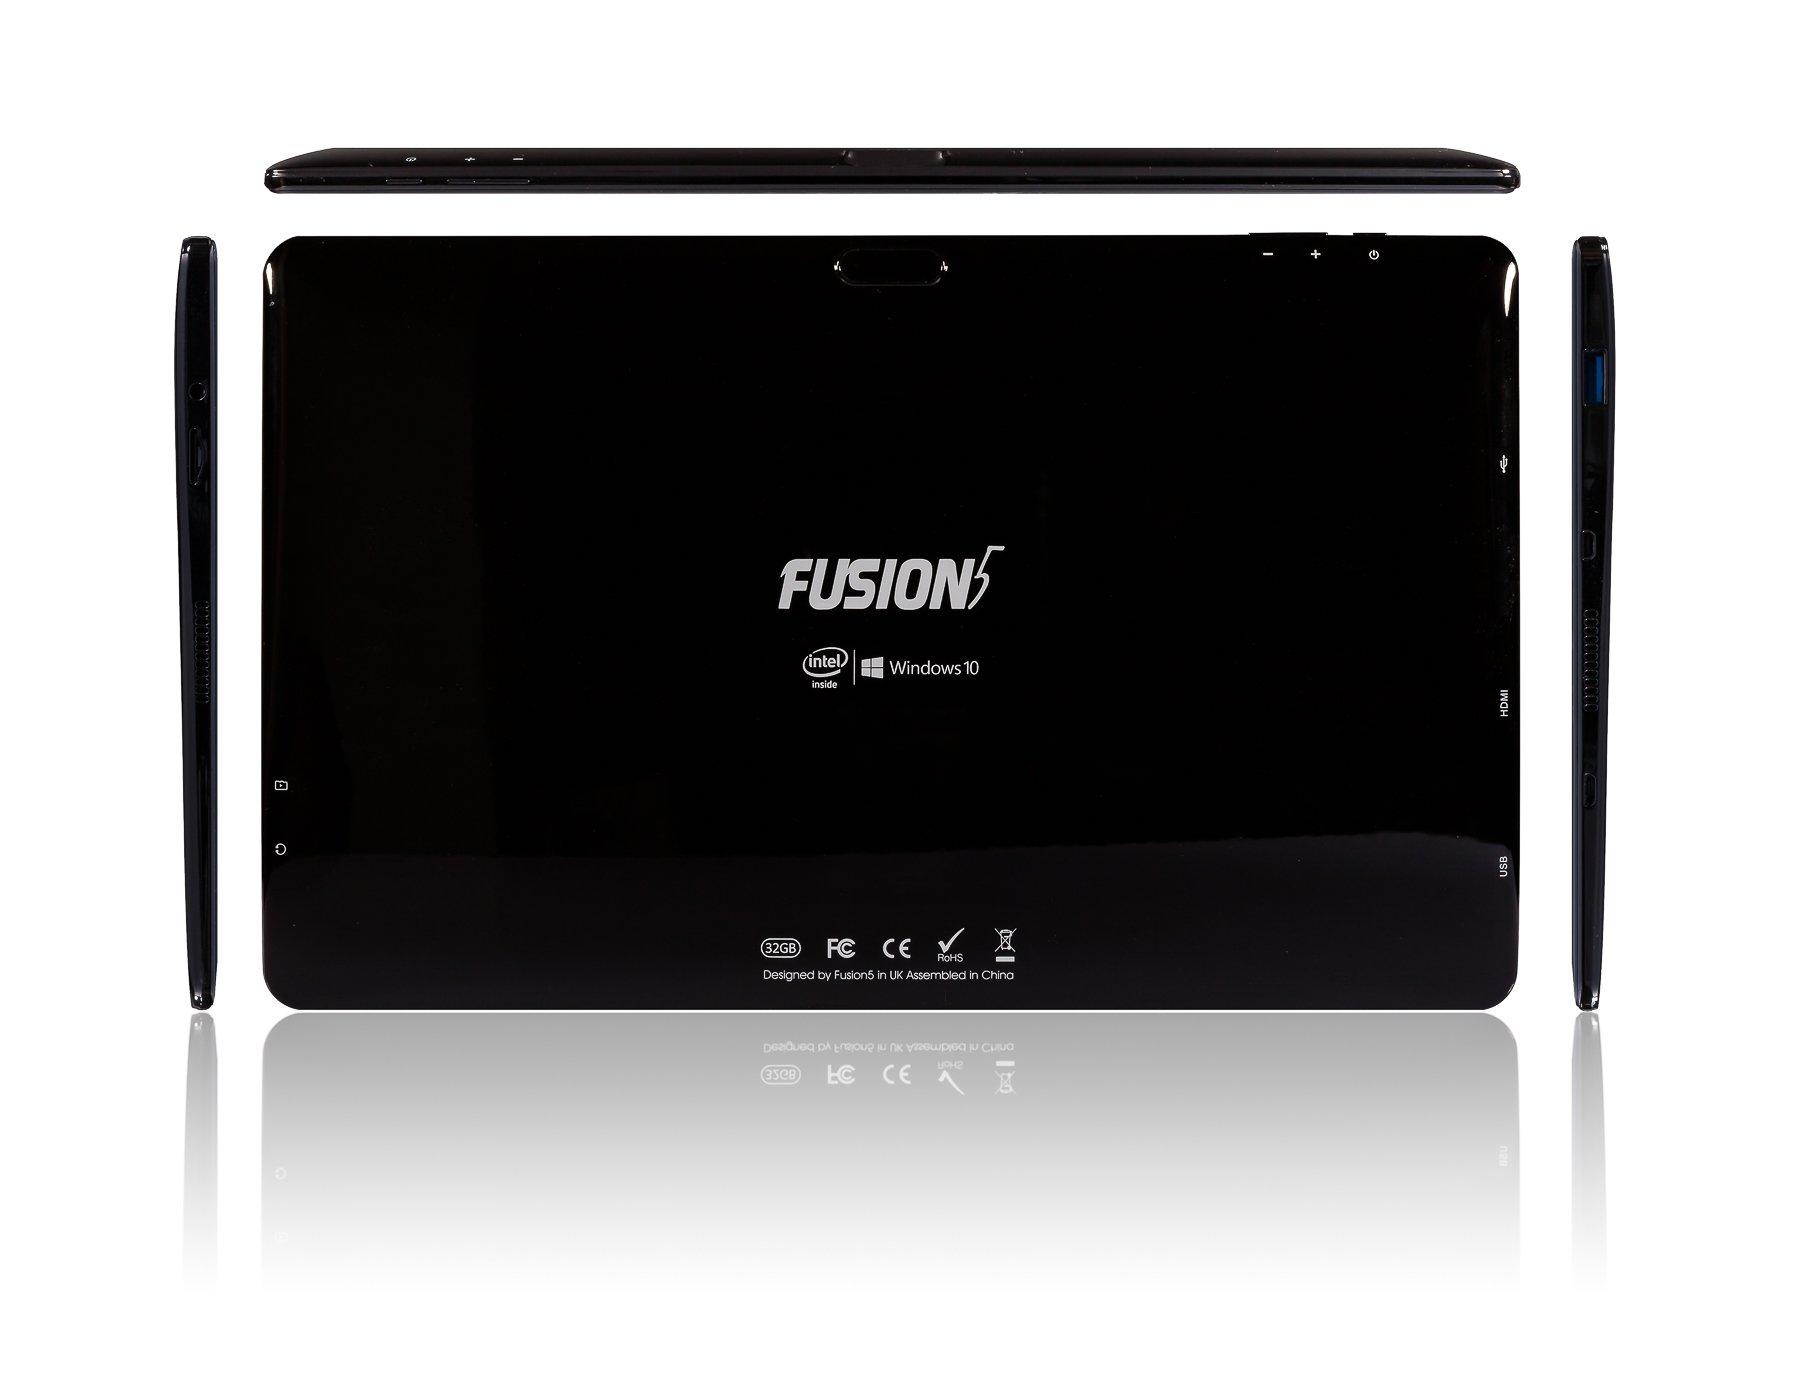 Fusion5 11 6